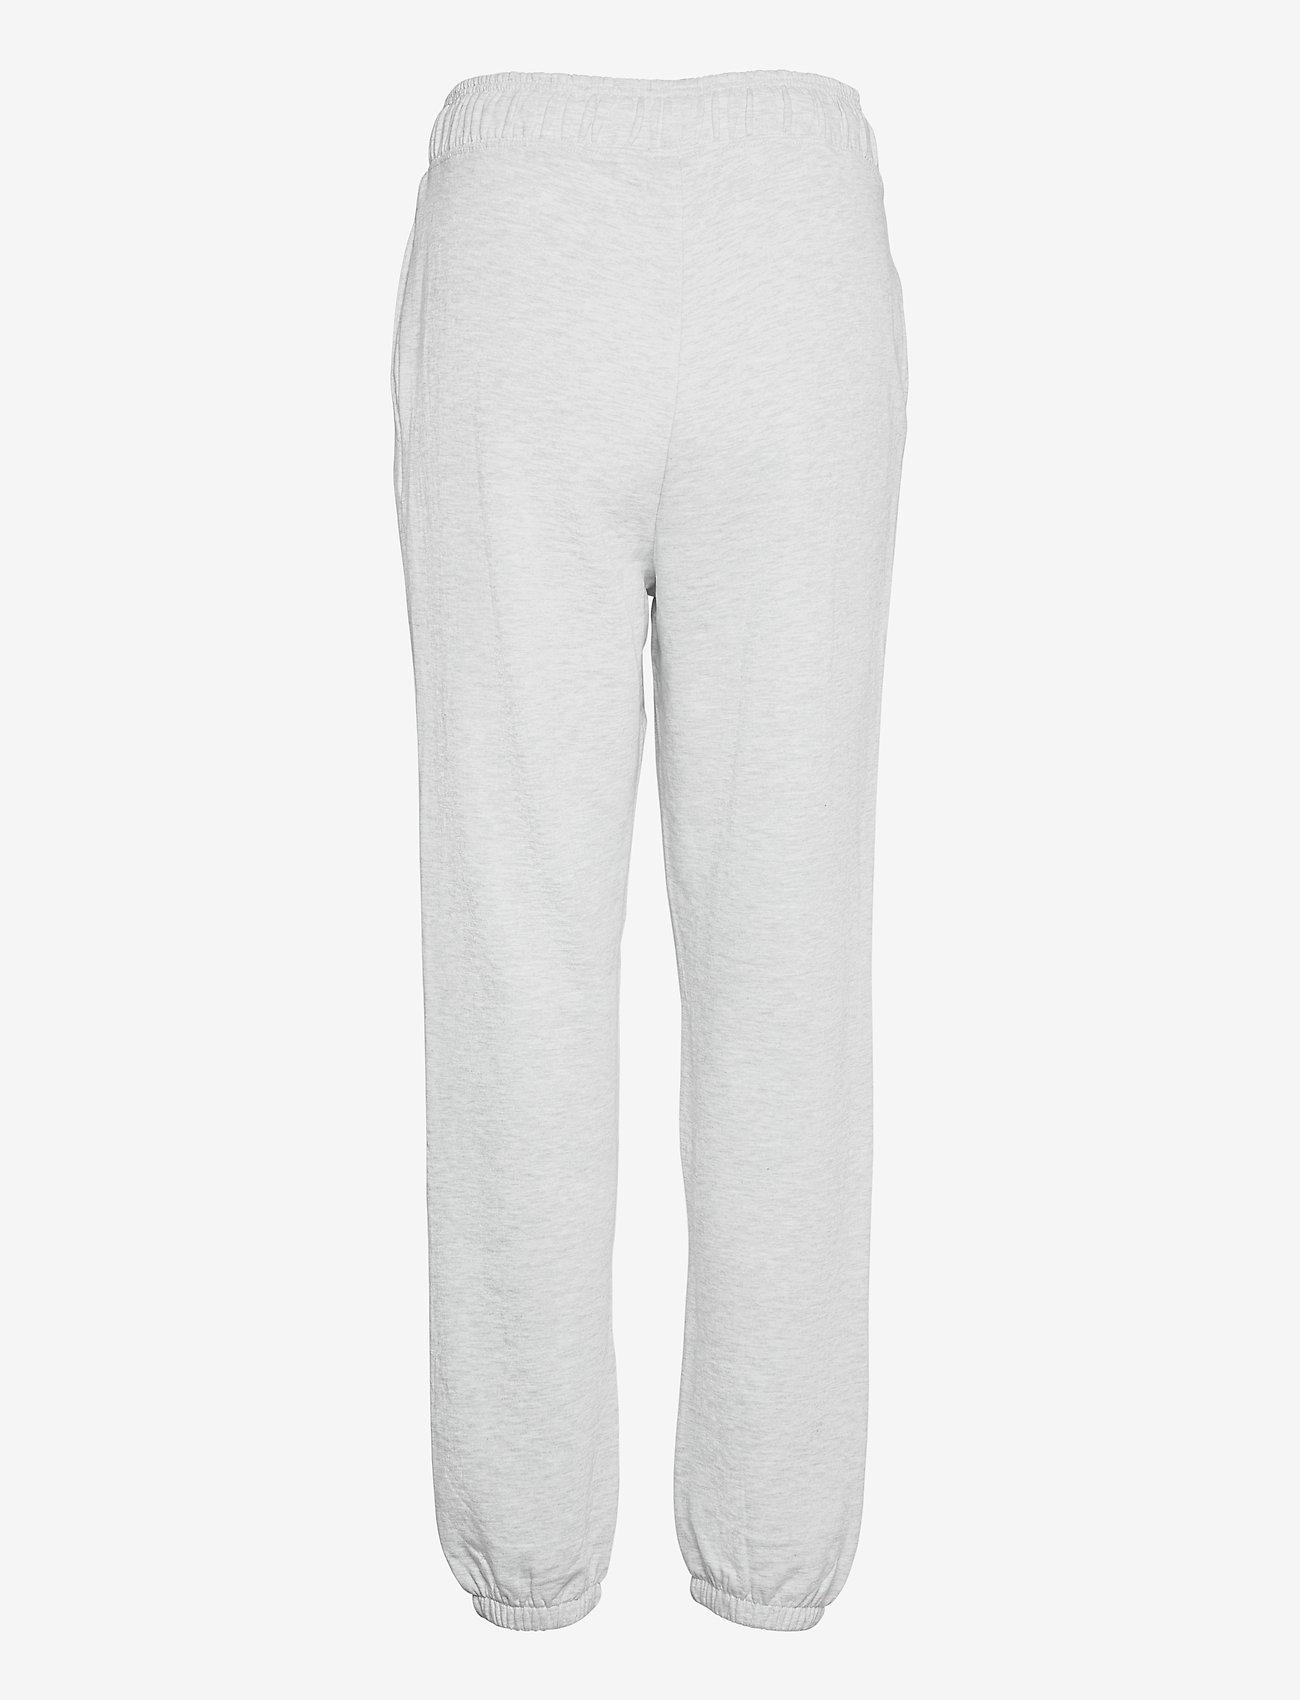 Vero Moda - VMODEZ HW SWEAT PANTS VMA - kläder - light grey melange - 1